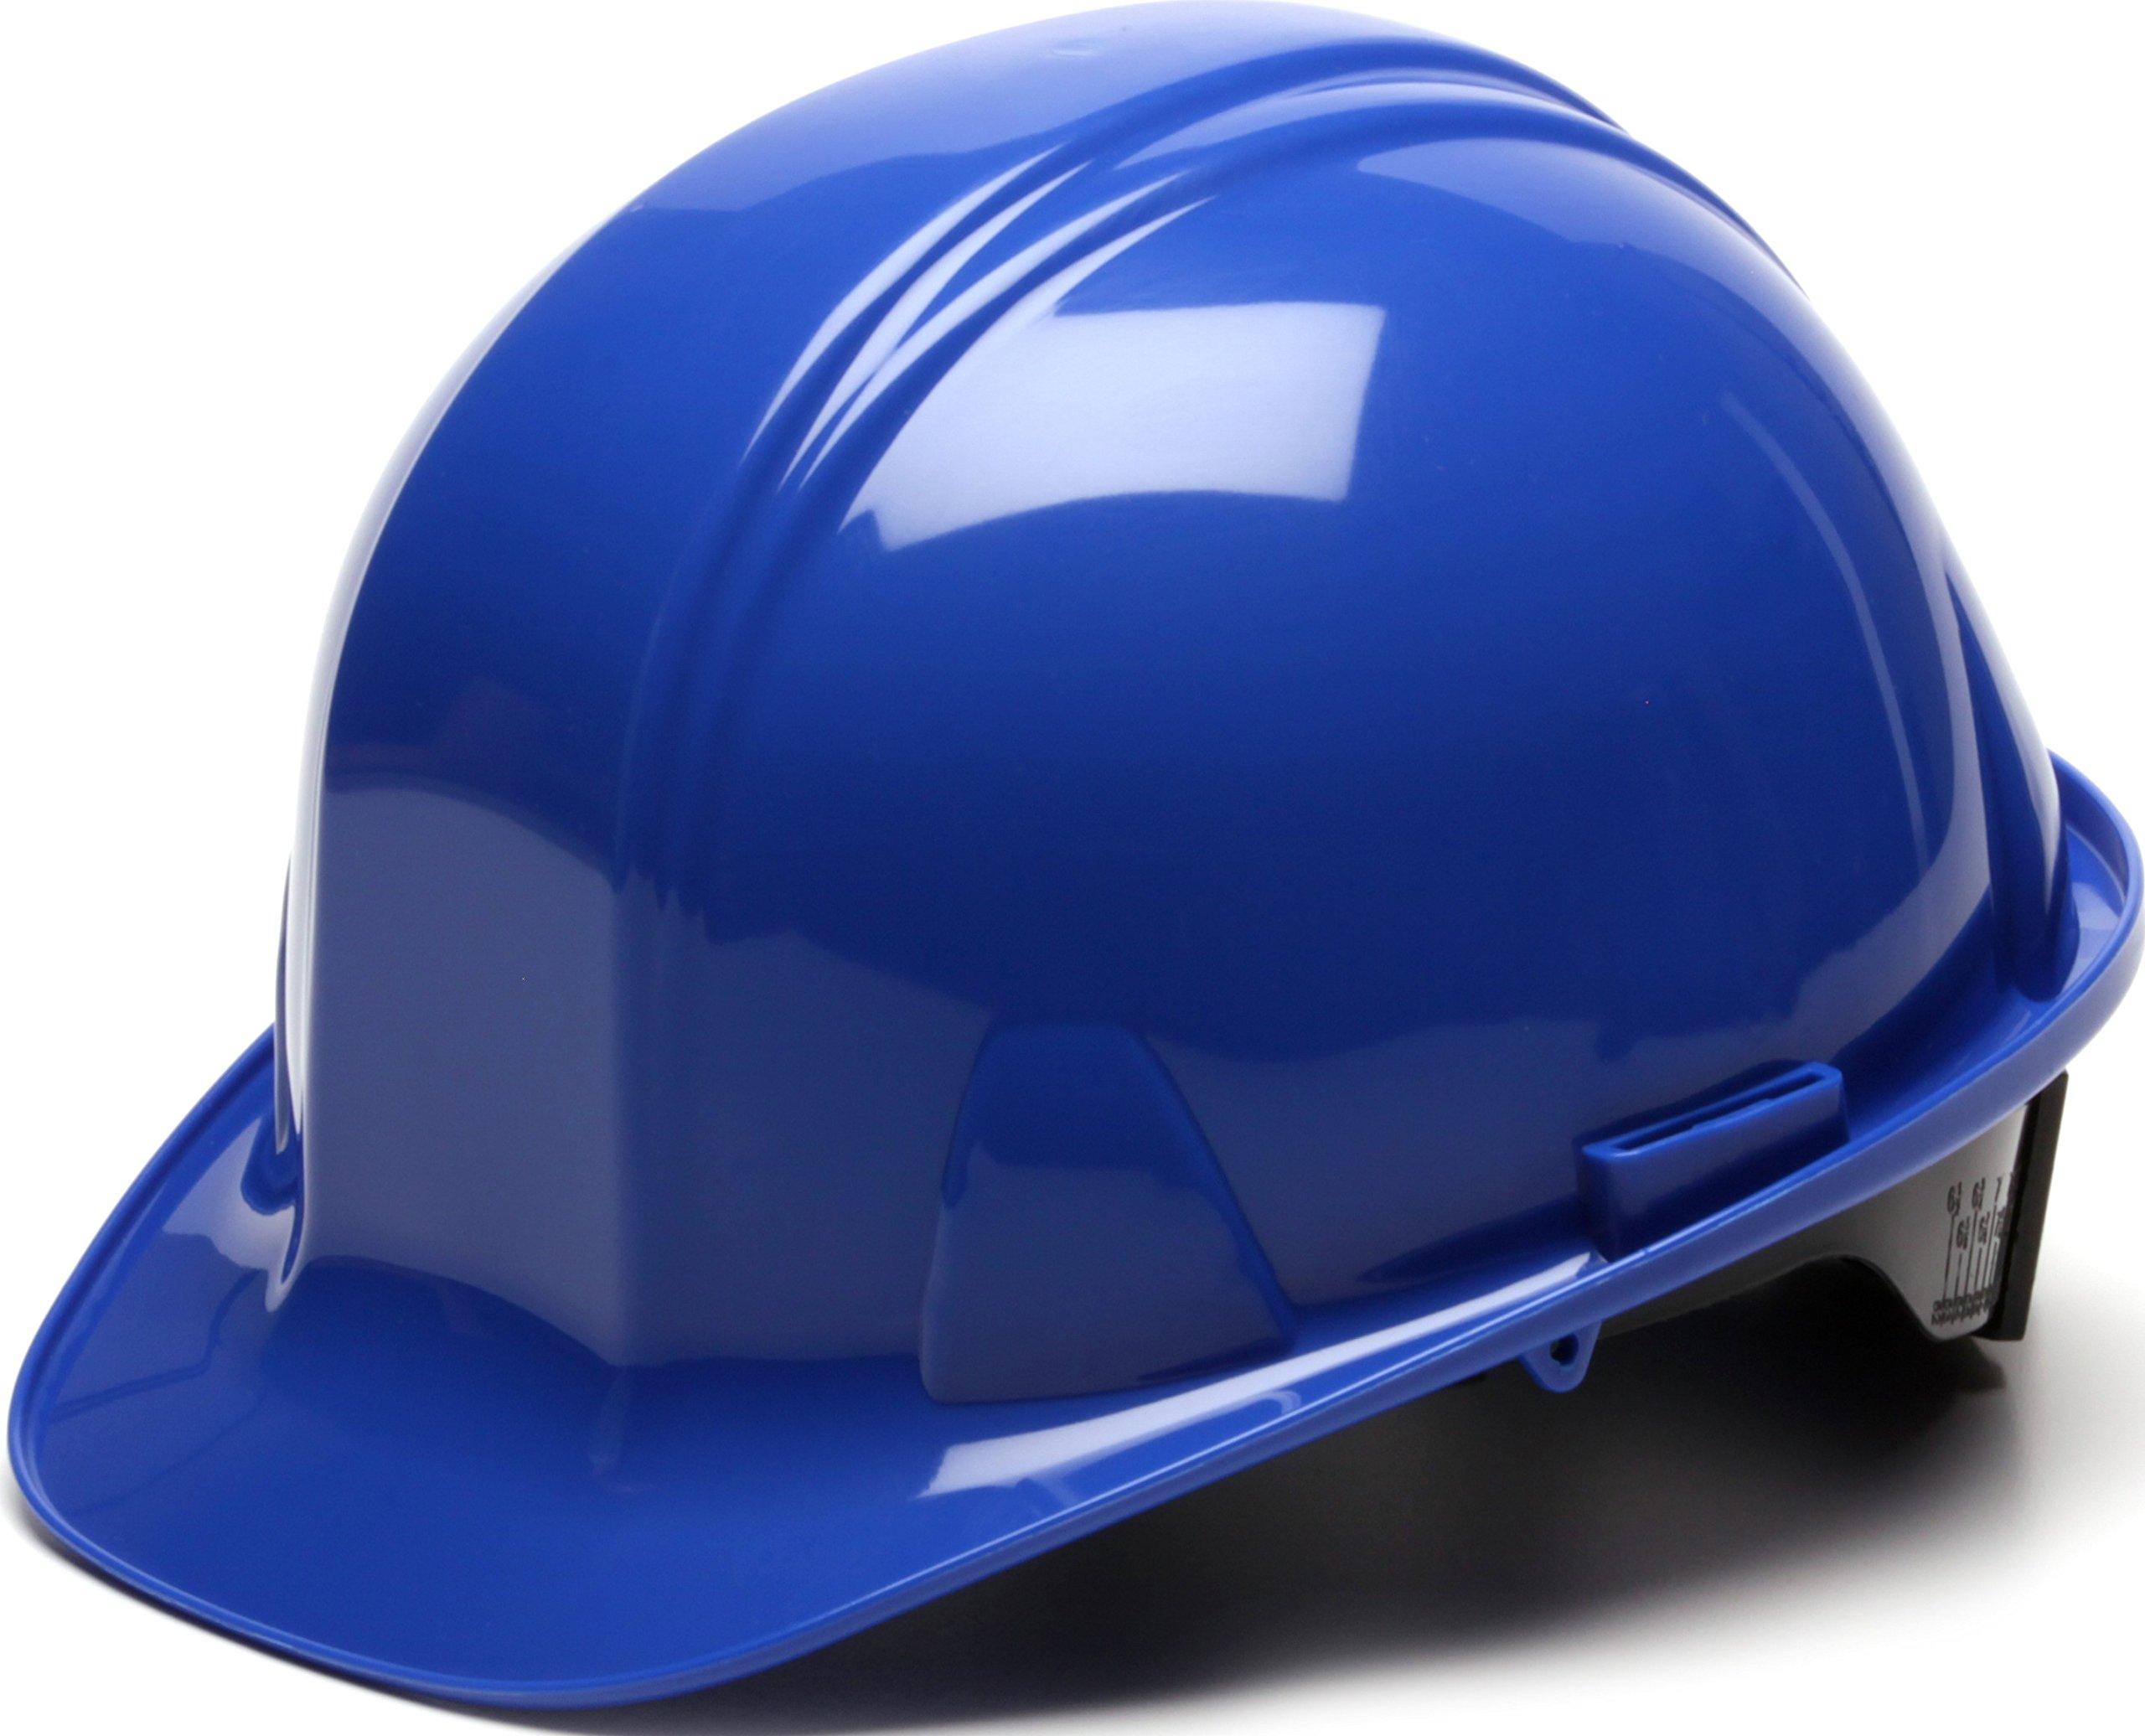 Pyramex Blue Cap Style 6 Point Ratchet Suspension Hard Hat